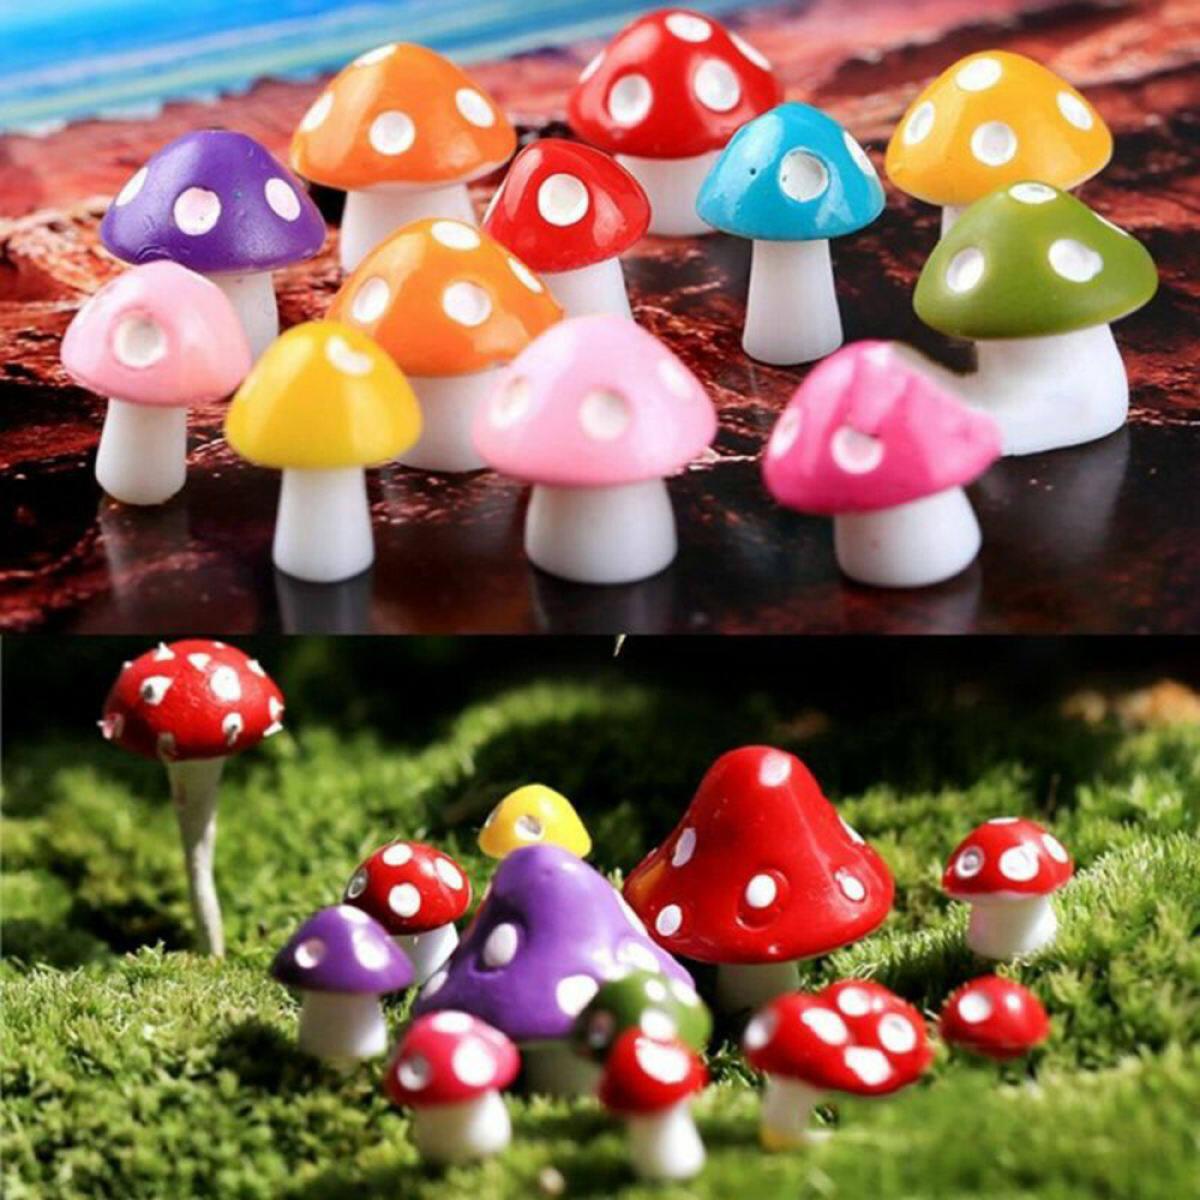 Mushroom Miniature Fairy Moss Terrarium Resin Craft Garden Art Decor Creative Lazada Singapore